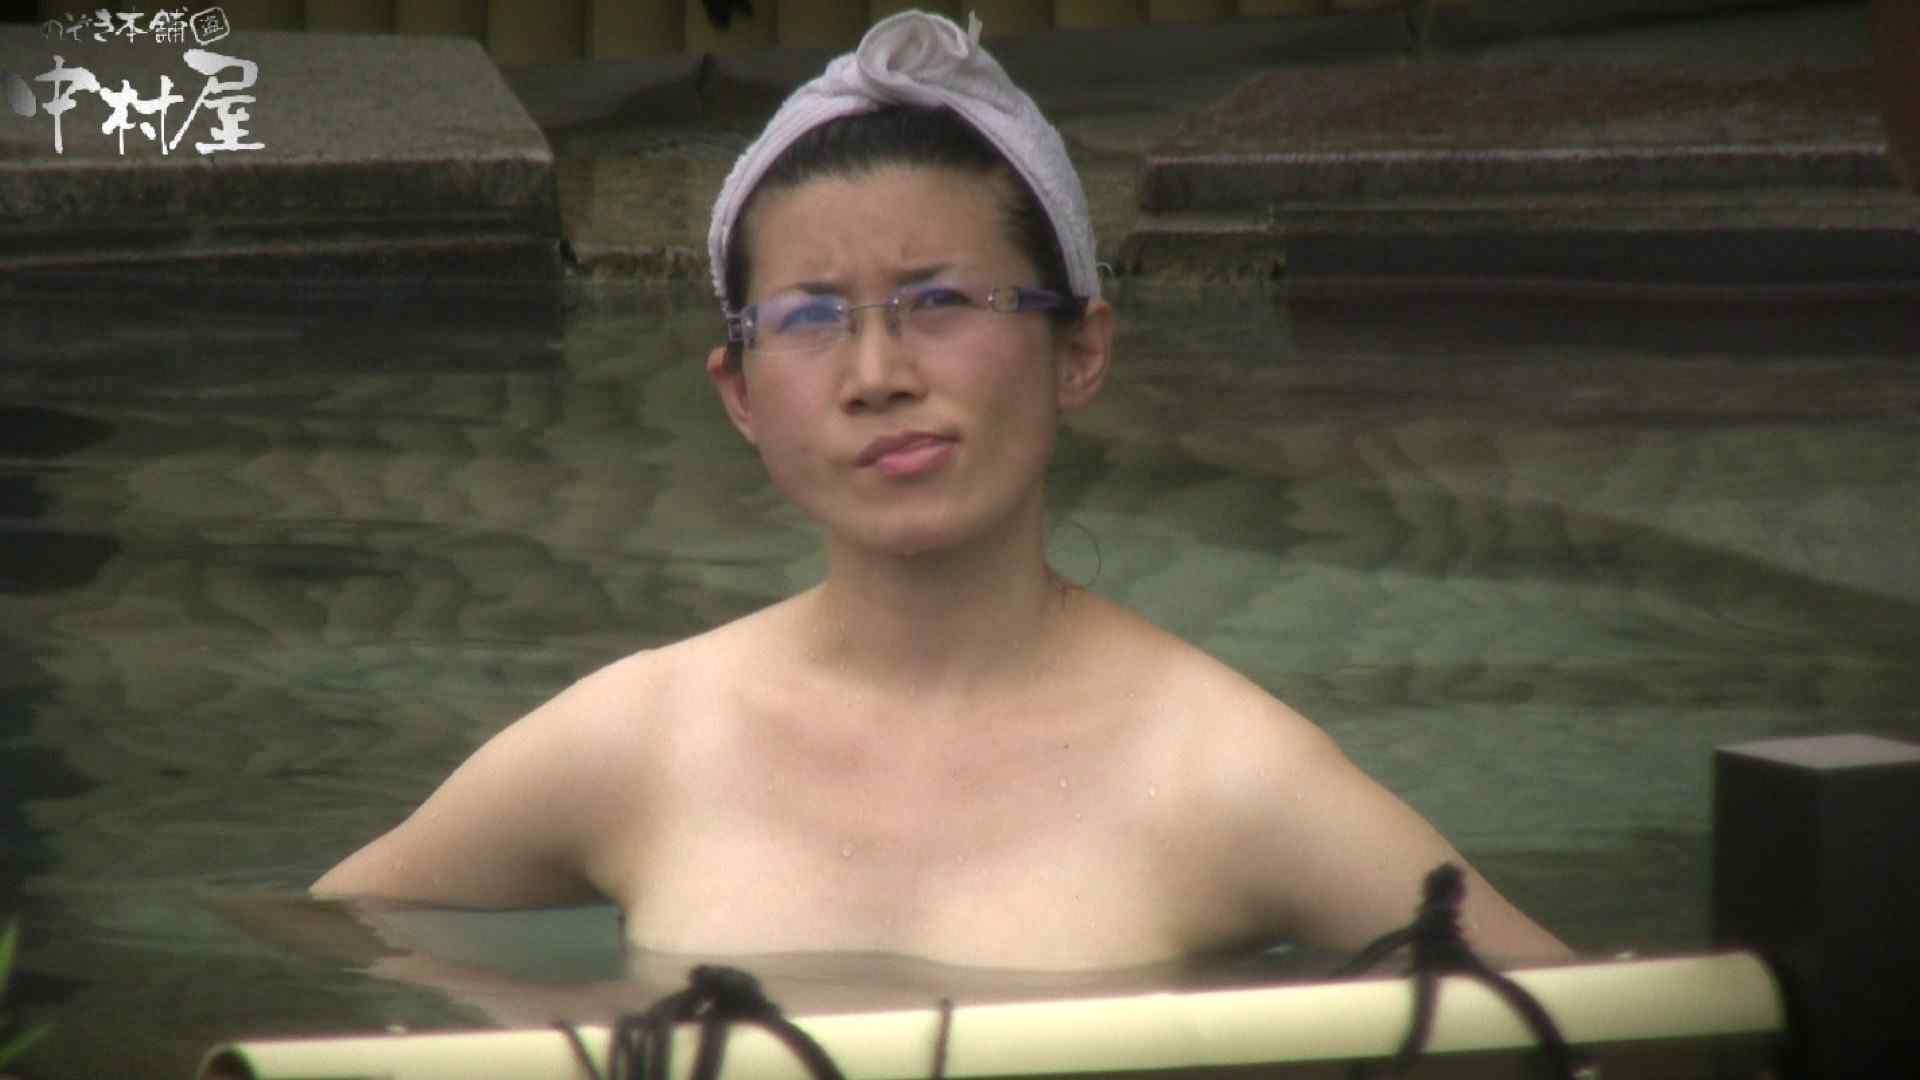 Aquaな露天風呂Vol.905 OLセックス | 露天  71画像 22